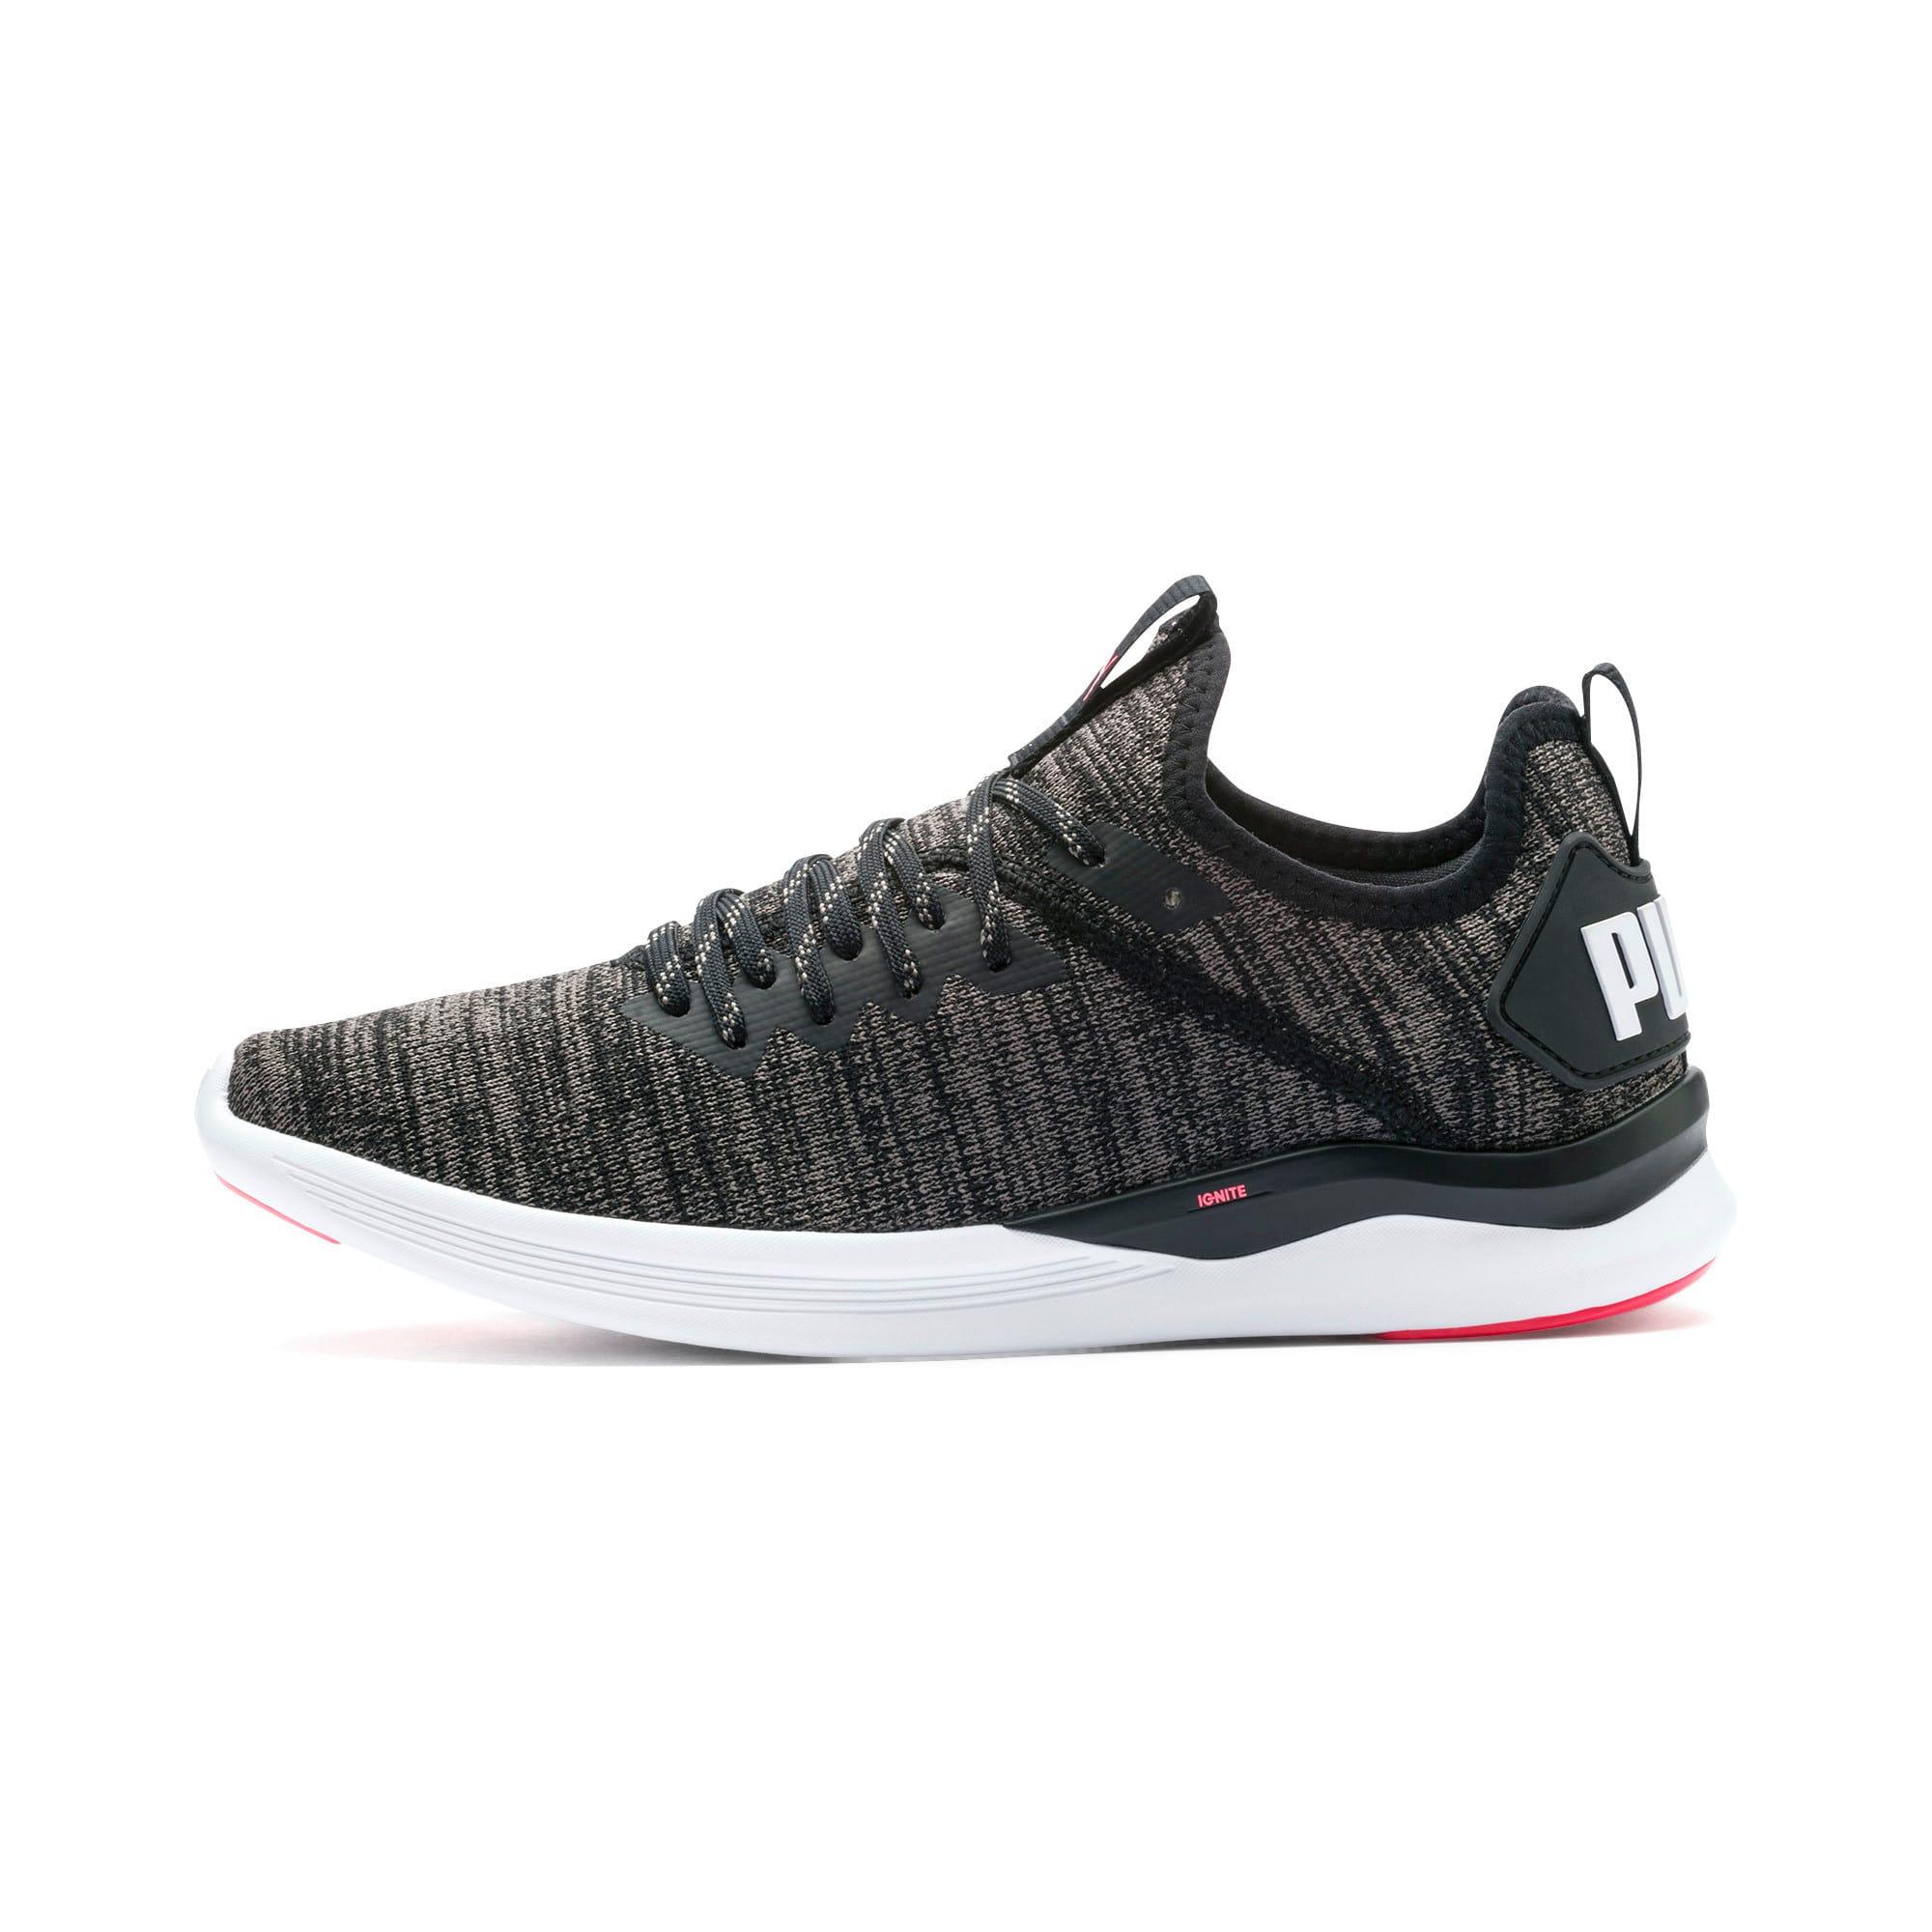 Thumbnail 1 of IGNITE Flash evoKNIT Women's Running Shoes, Black-White-Pink Alert, medium